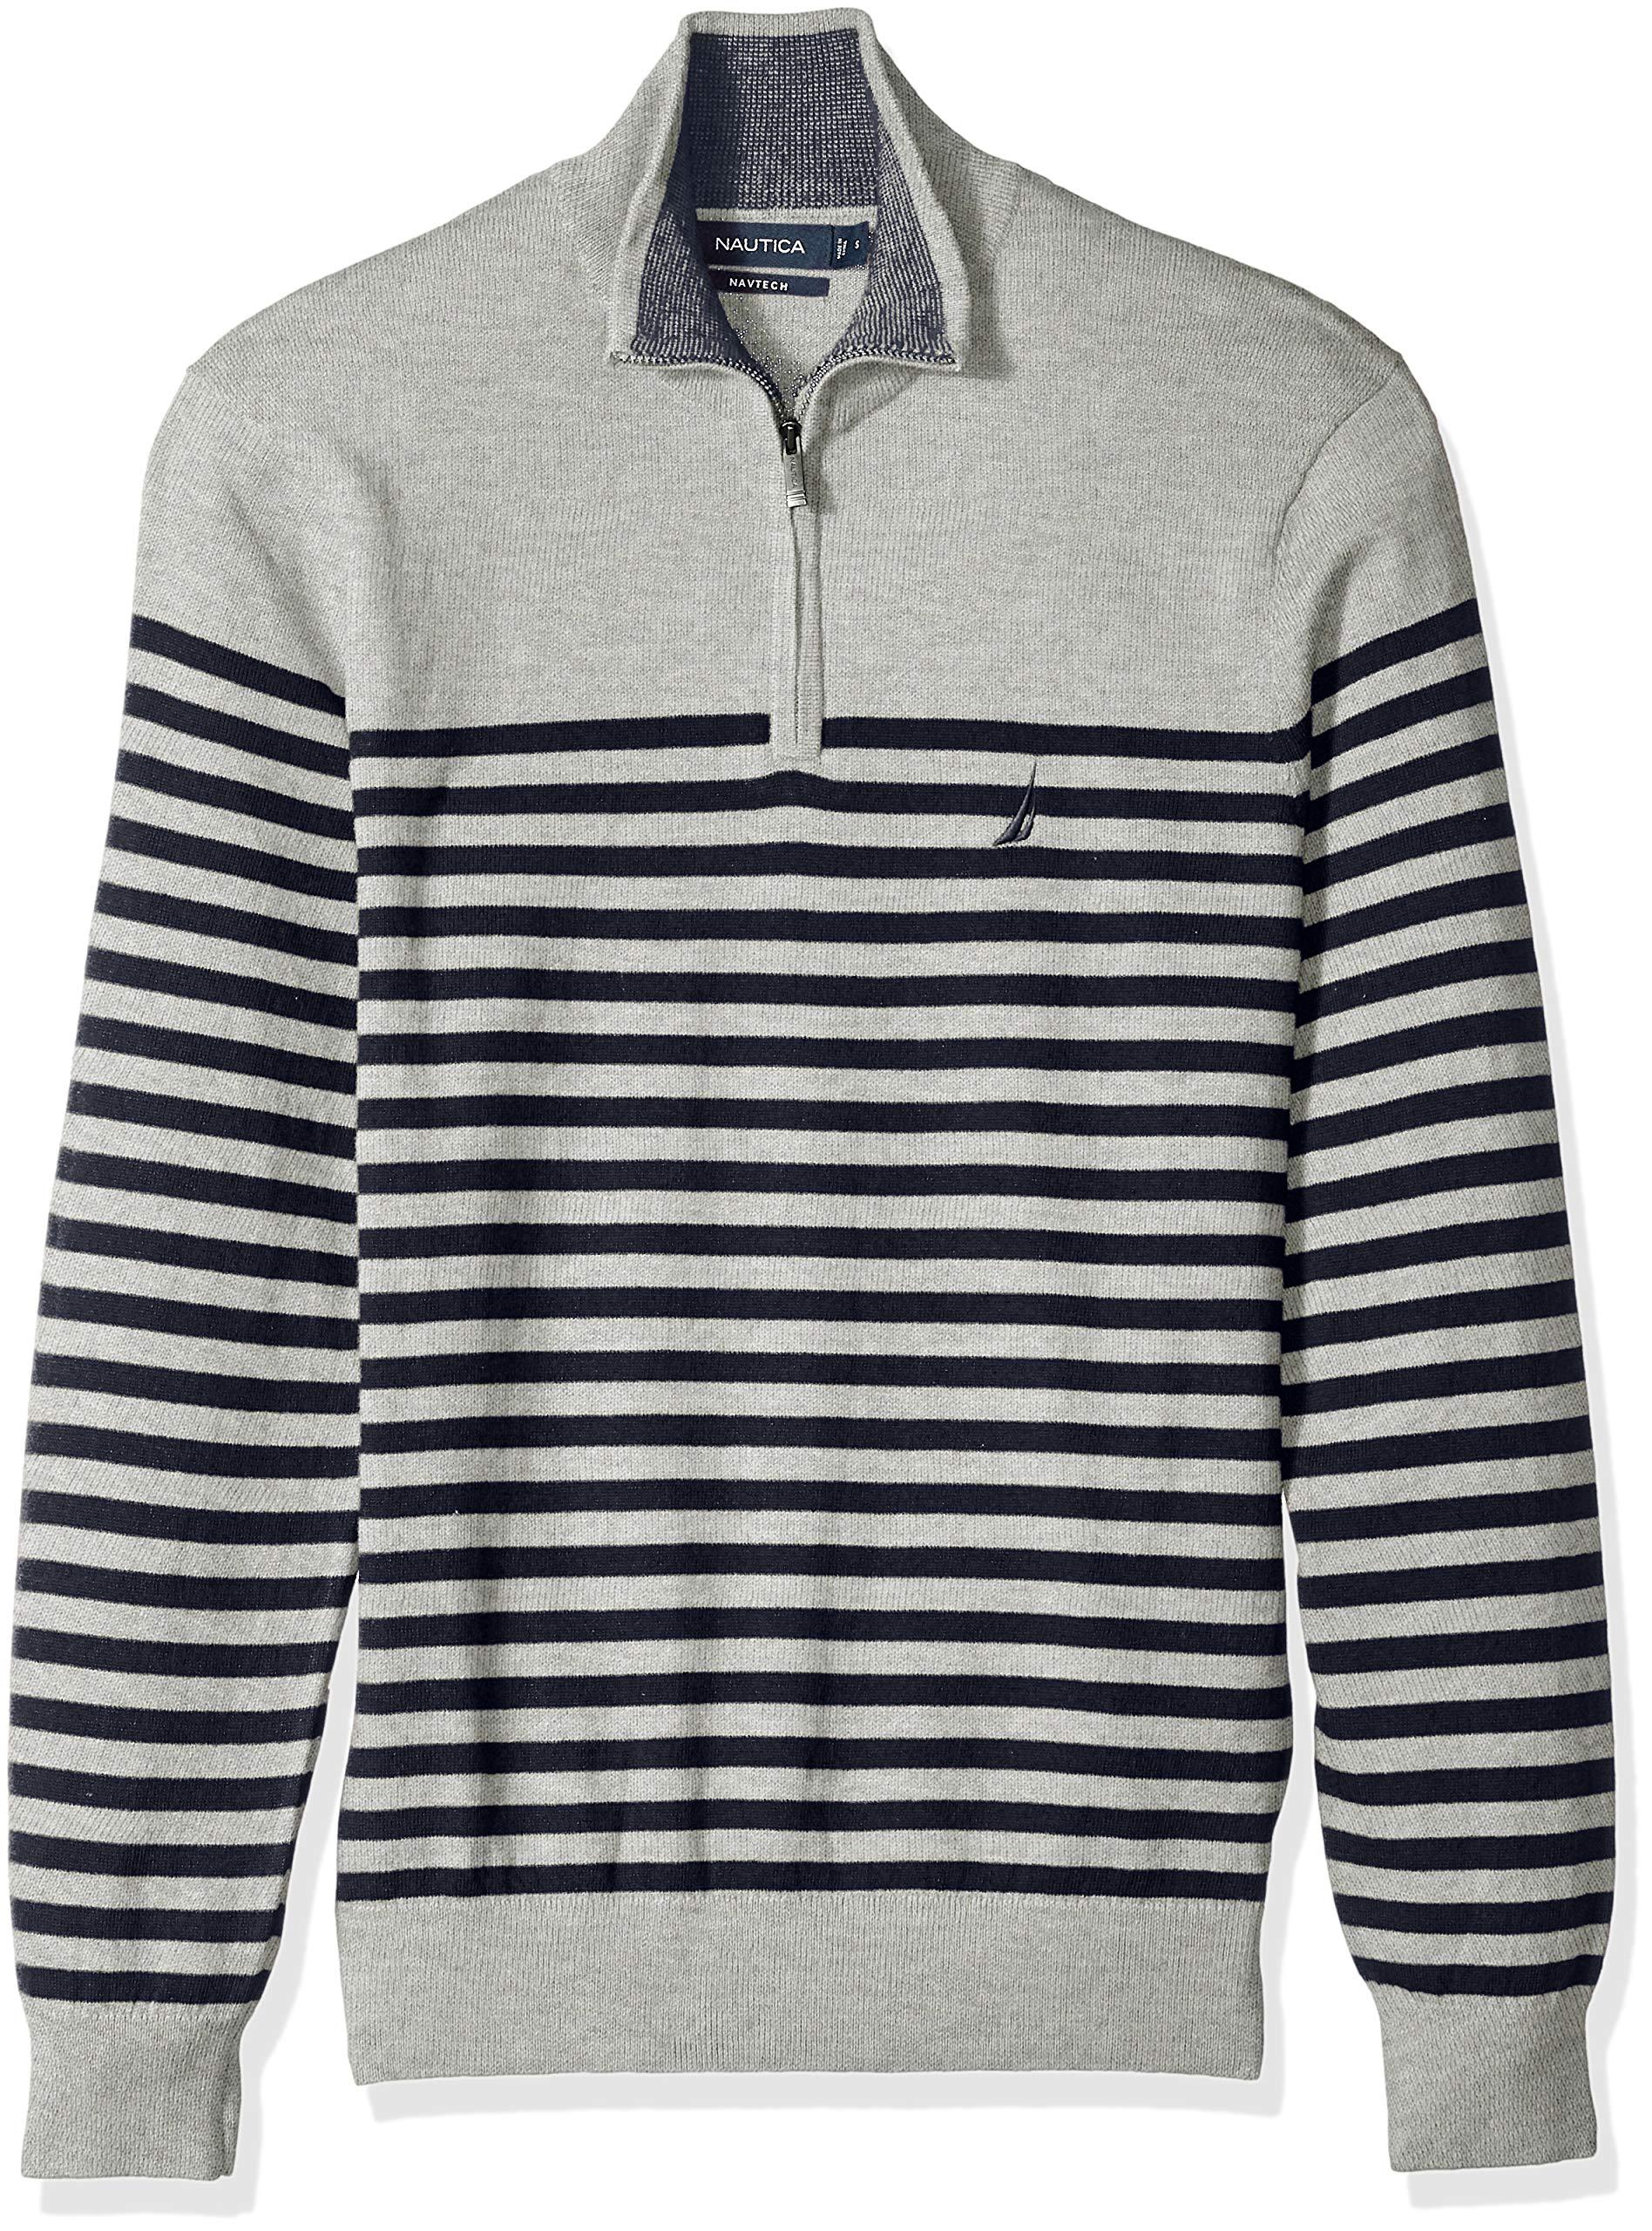 Nautica Men's Long Sleeve 1/4 Zip Sweater, Grey Heather, Large